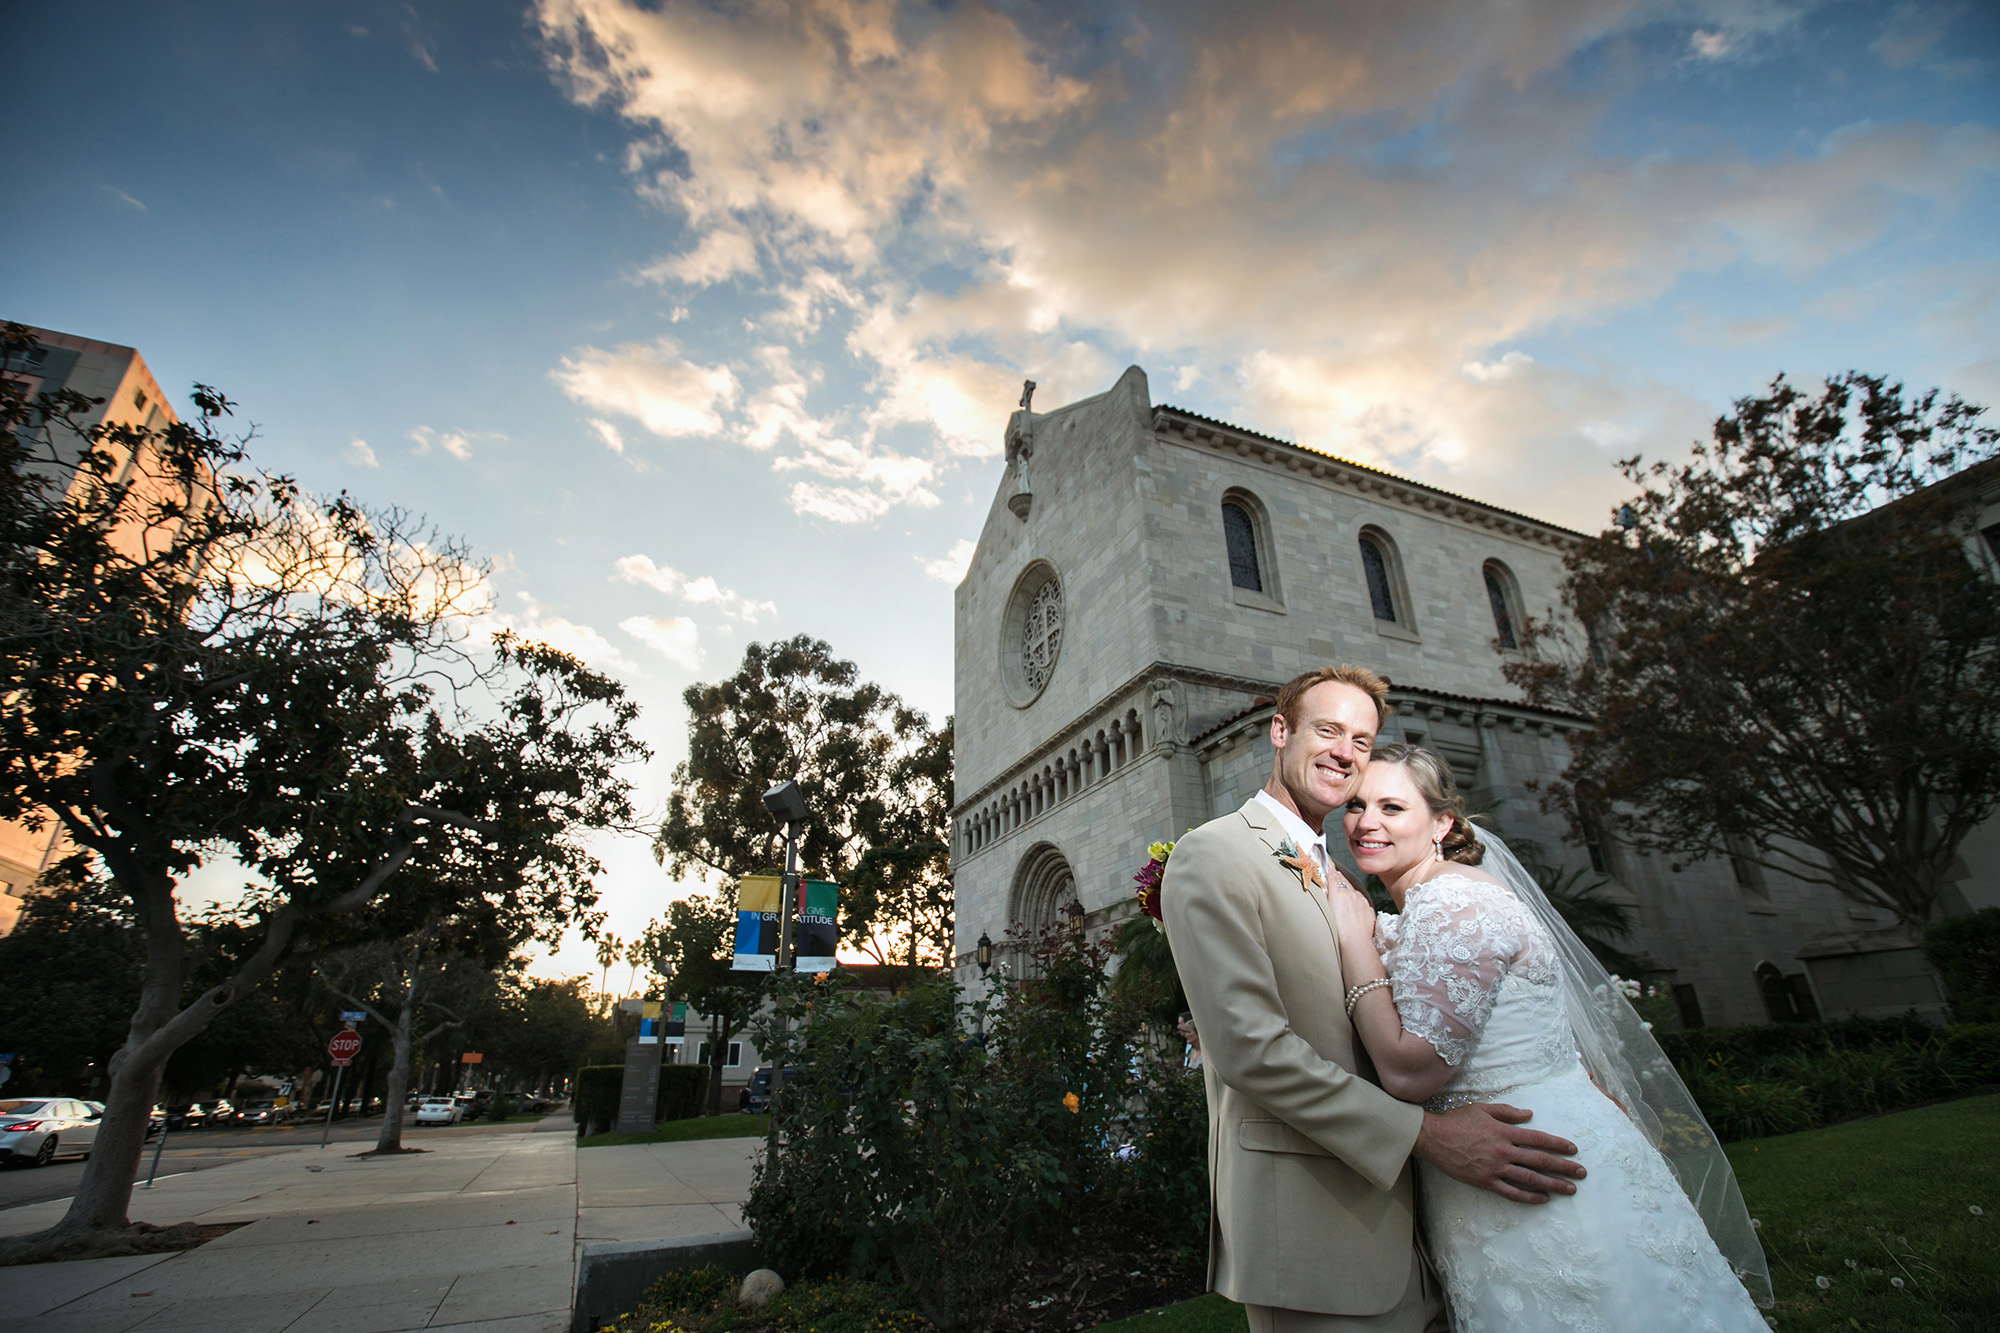 unforgettable-st-monica-wedding-carrie-vines-photography-088.jpg